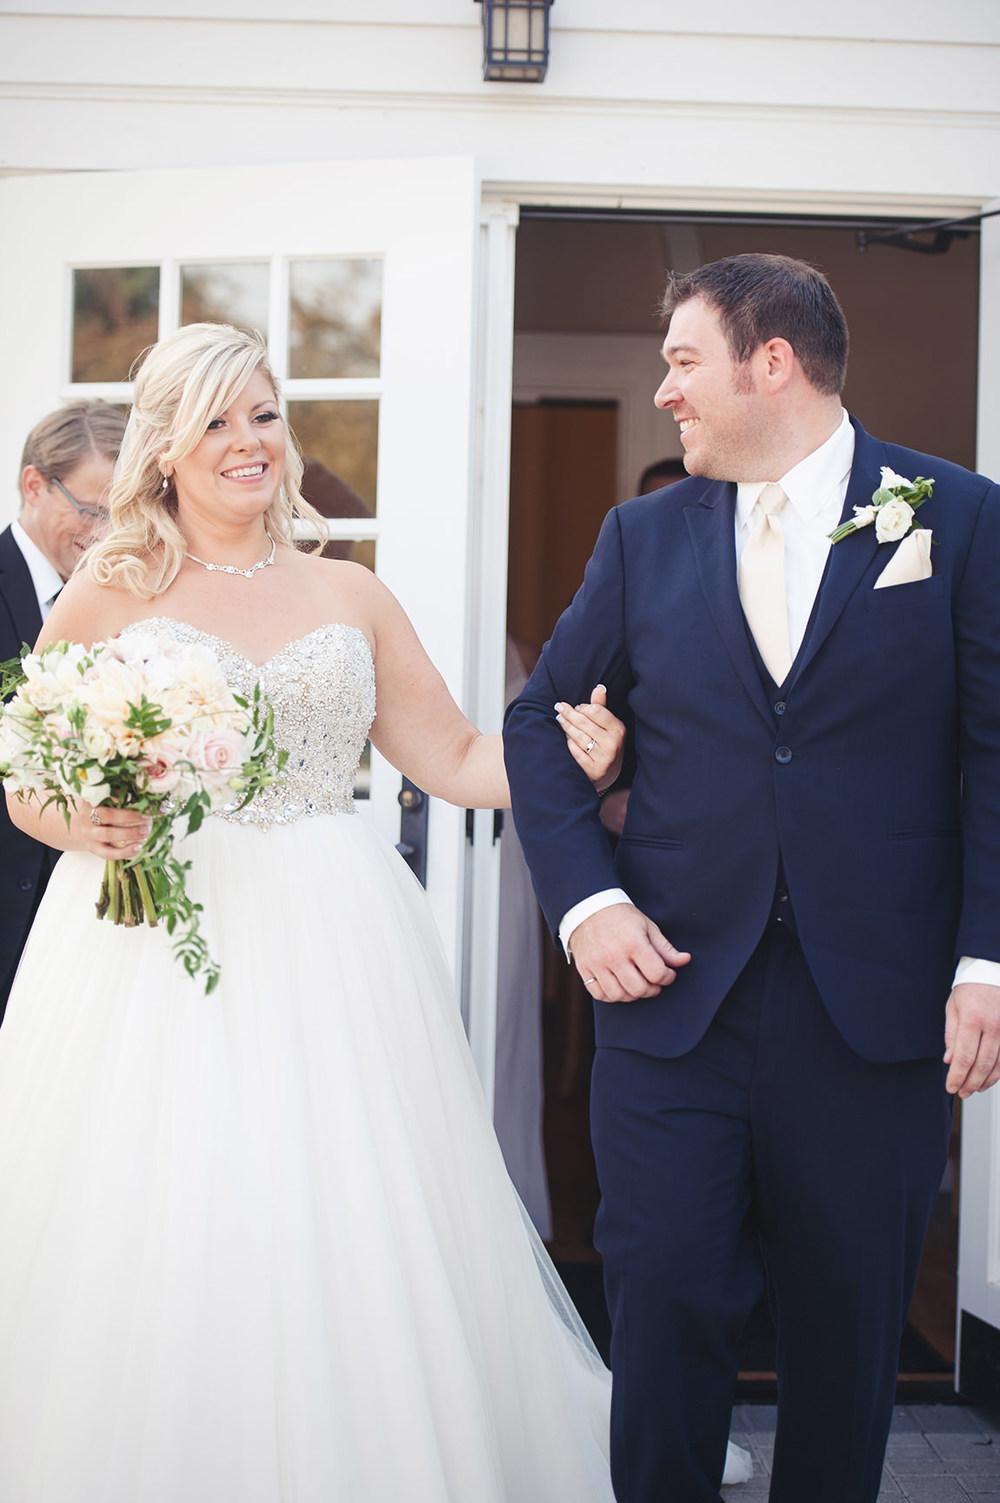 St-Catharines-Wedding-Stone-Mill-Inn-Amy-Darryl-photography-by-Morgan-Falk-030.JPG